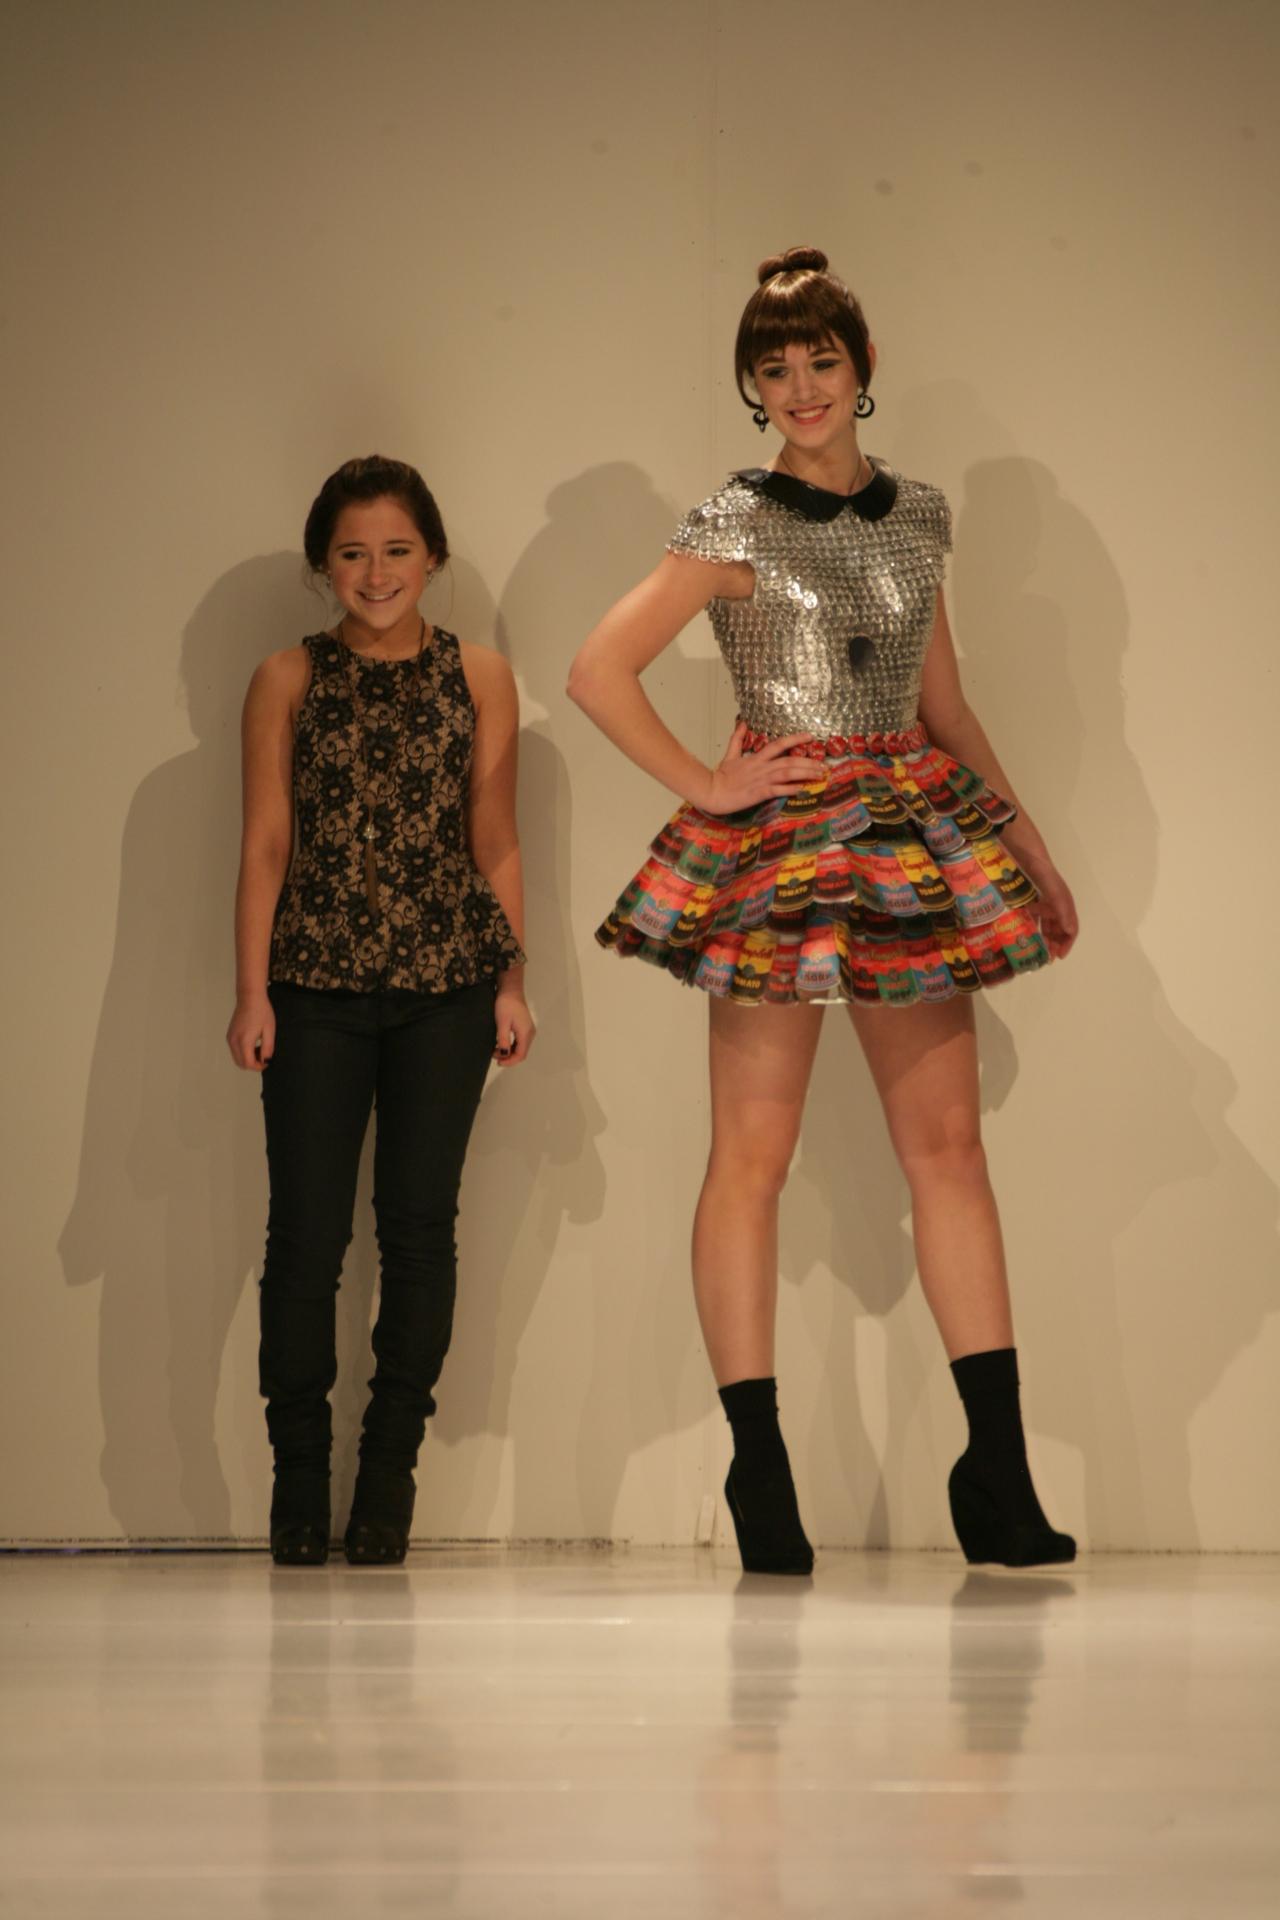 Annie Bloomston with her design | Birmingham Fashion Week 2013Photo Credit: Vintage Inspired Passionista